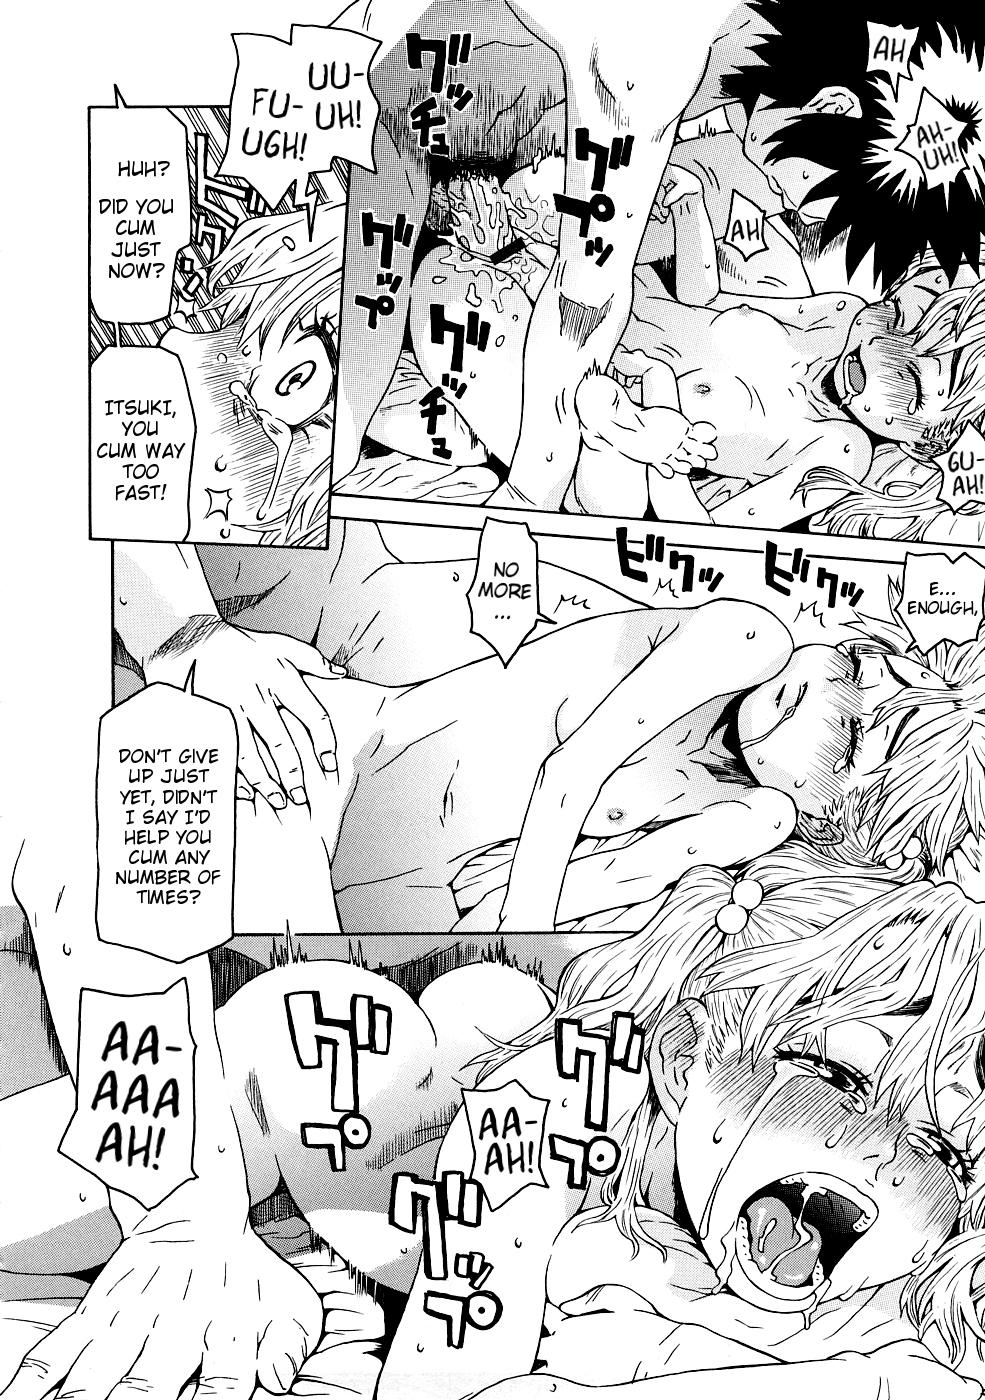 [Kobayashi Oukei] Onii-chan no Baka | Onii-chan You Idiot [English] {Mistvern} 15